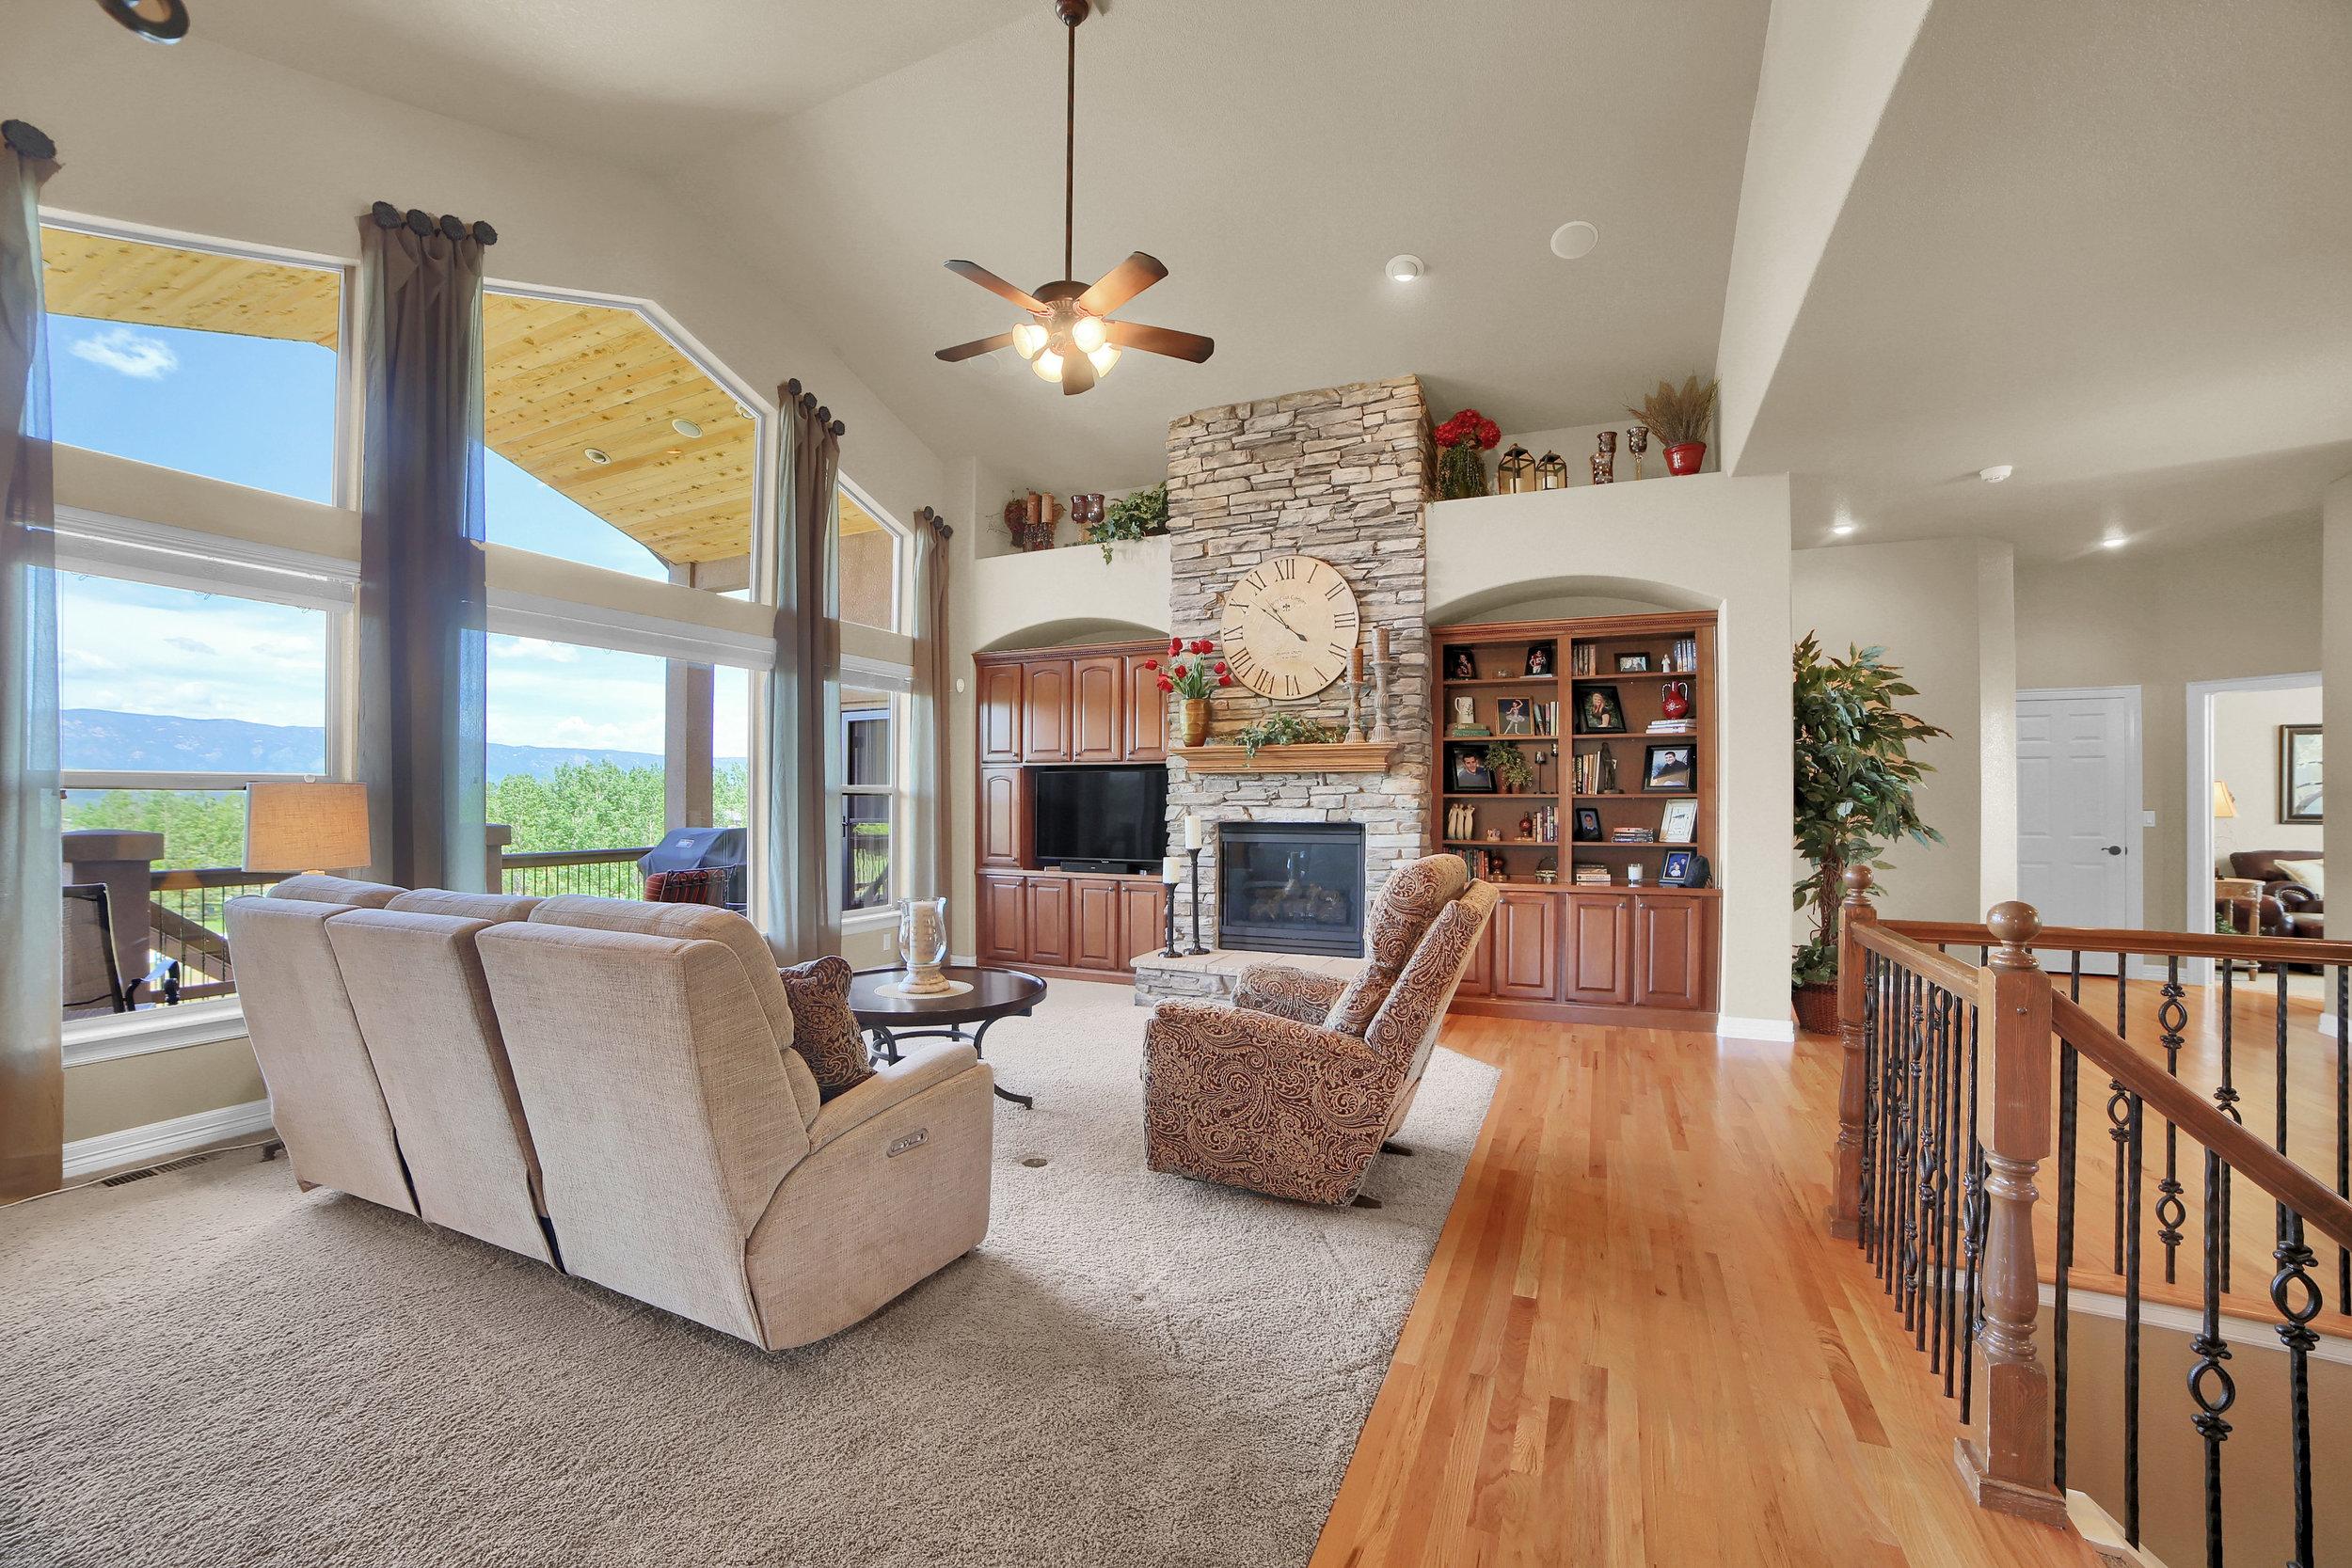 12496 Creekhurst Dr Colorado-print-031-059-Family Room-3647x2432-300dpi.jpg